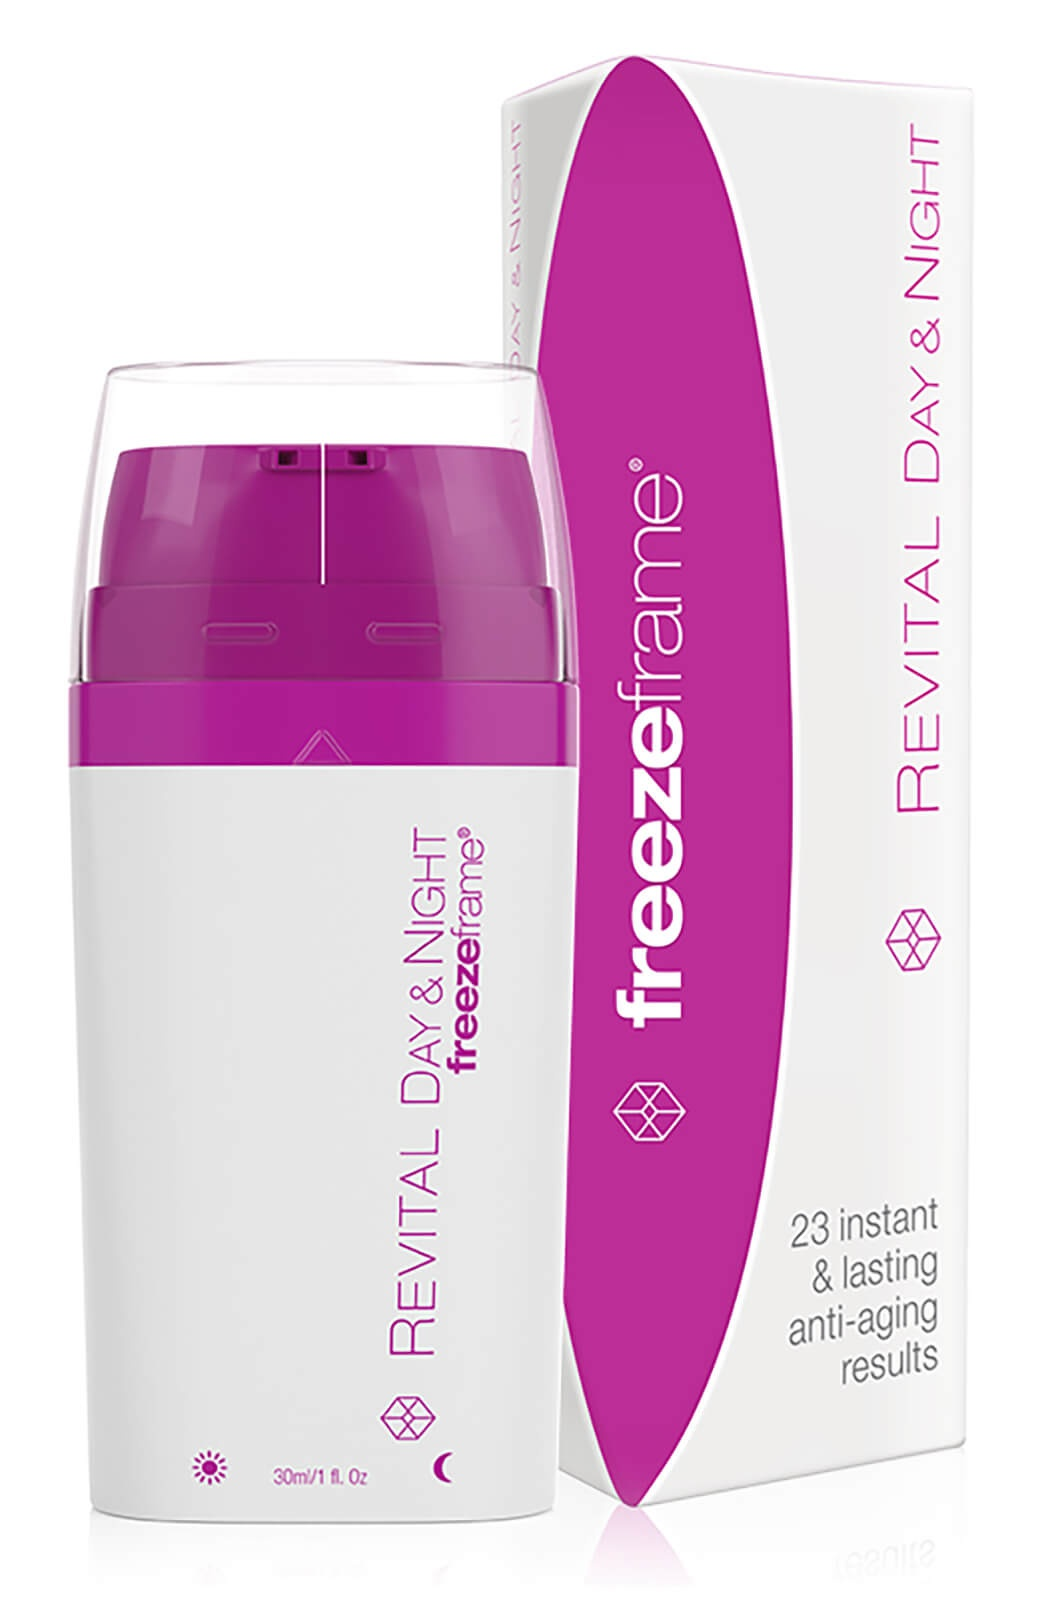 Freezeframe Revital Day Cream